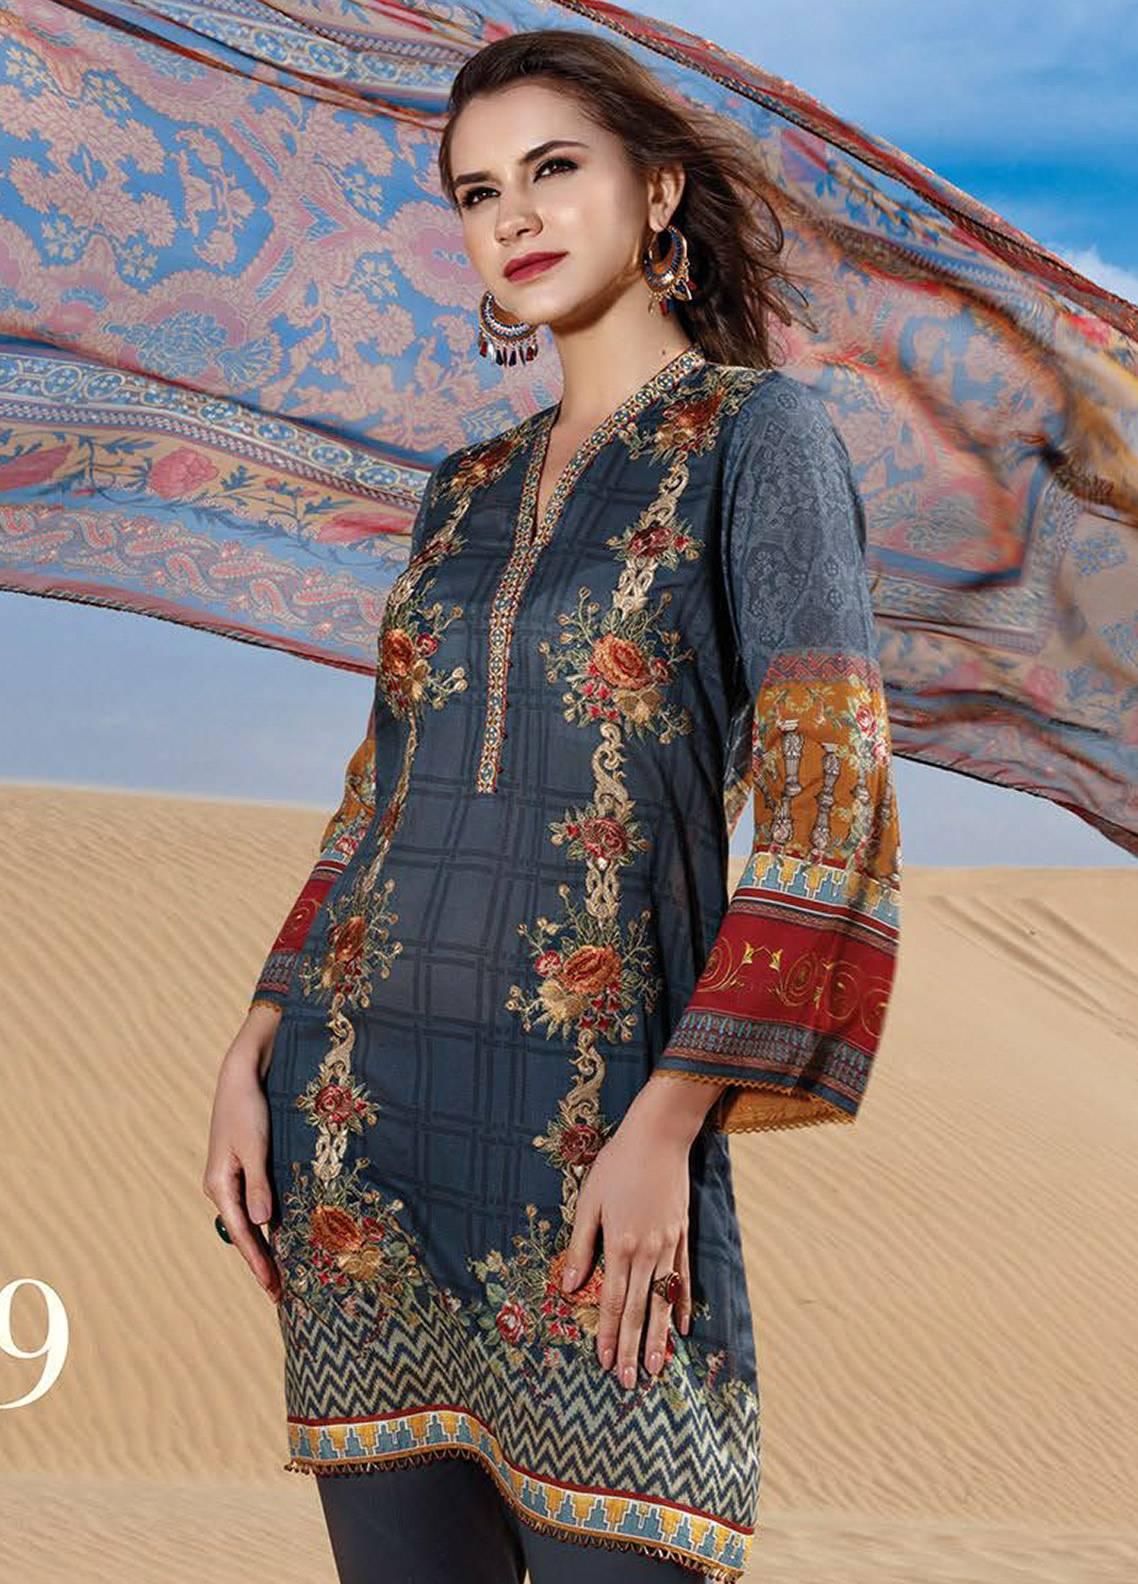 e4789bb9da52b Fuchsia Baroque Embroidered Lawn Unstitched 3 Piece Suit BQ18-L2 09 -  Summer Collection